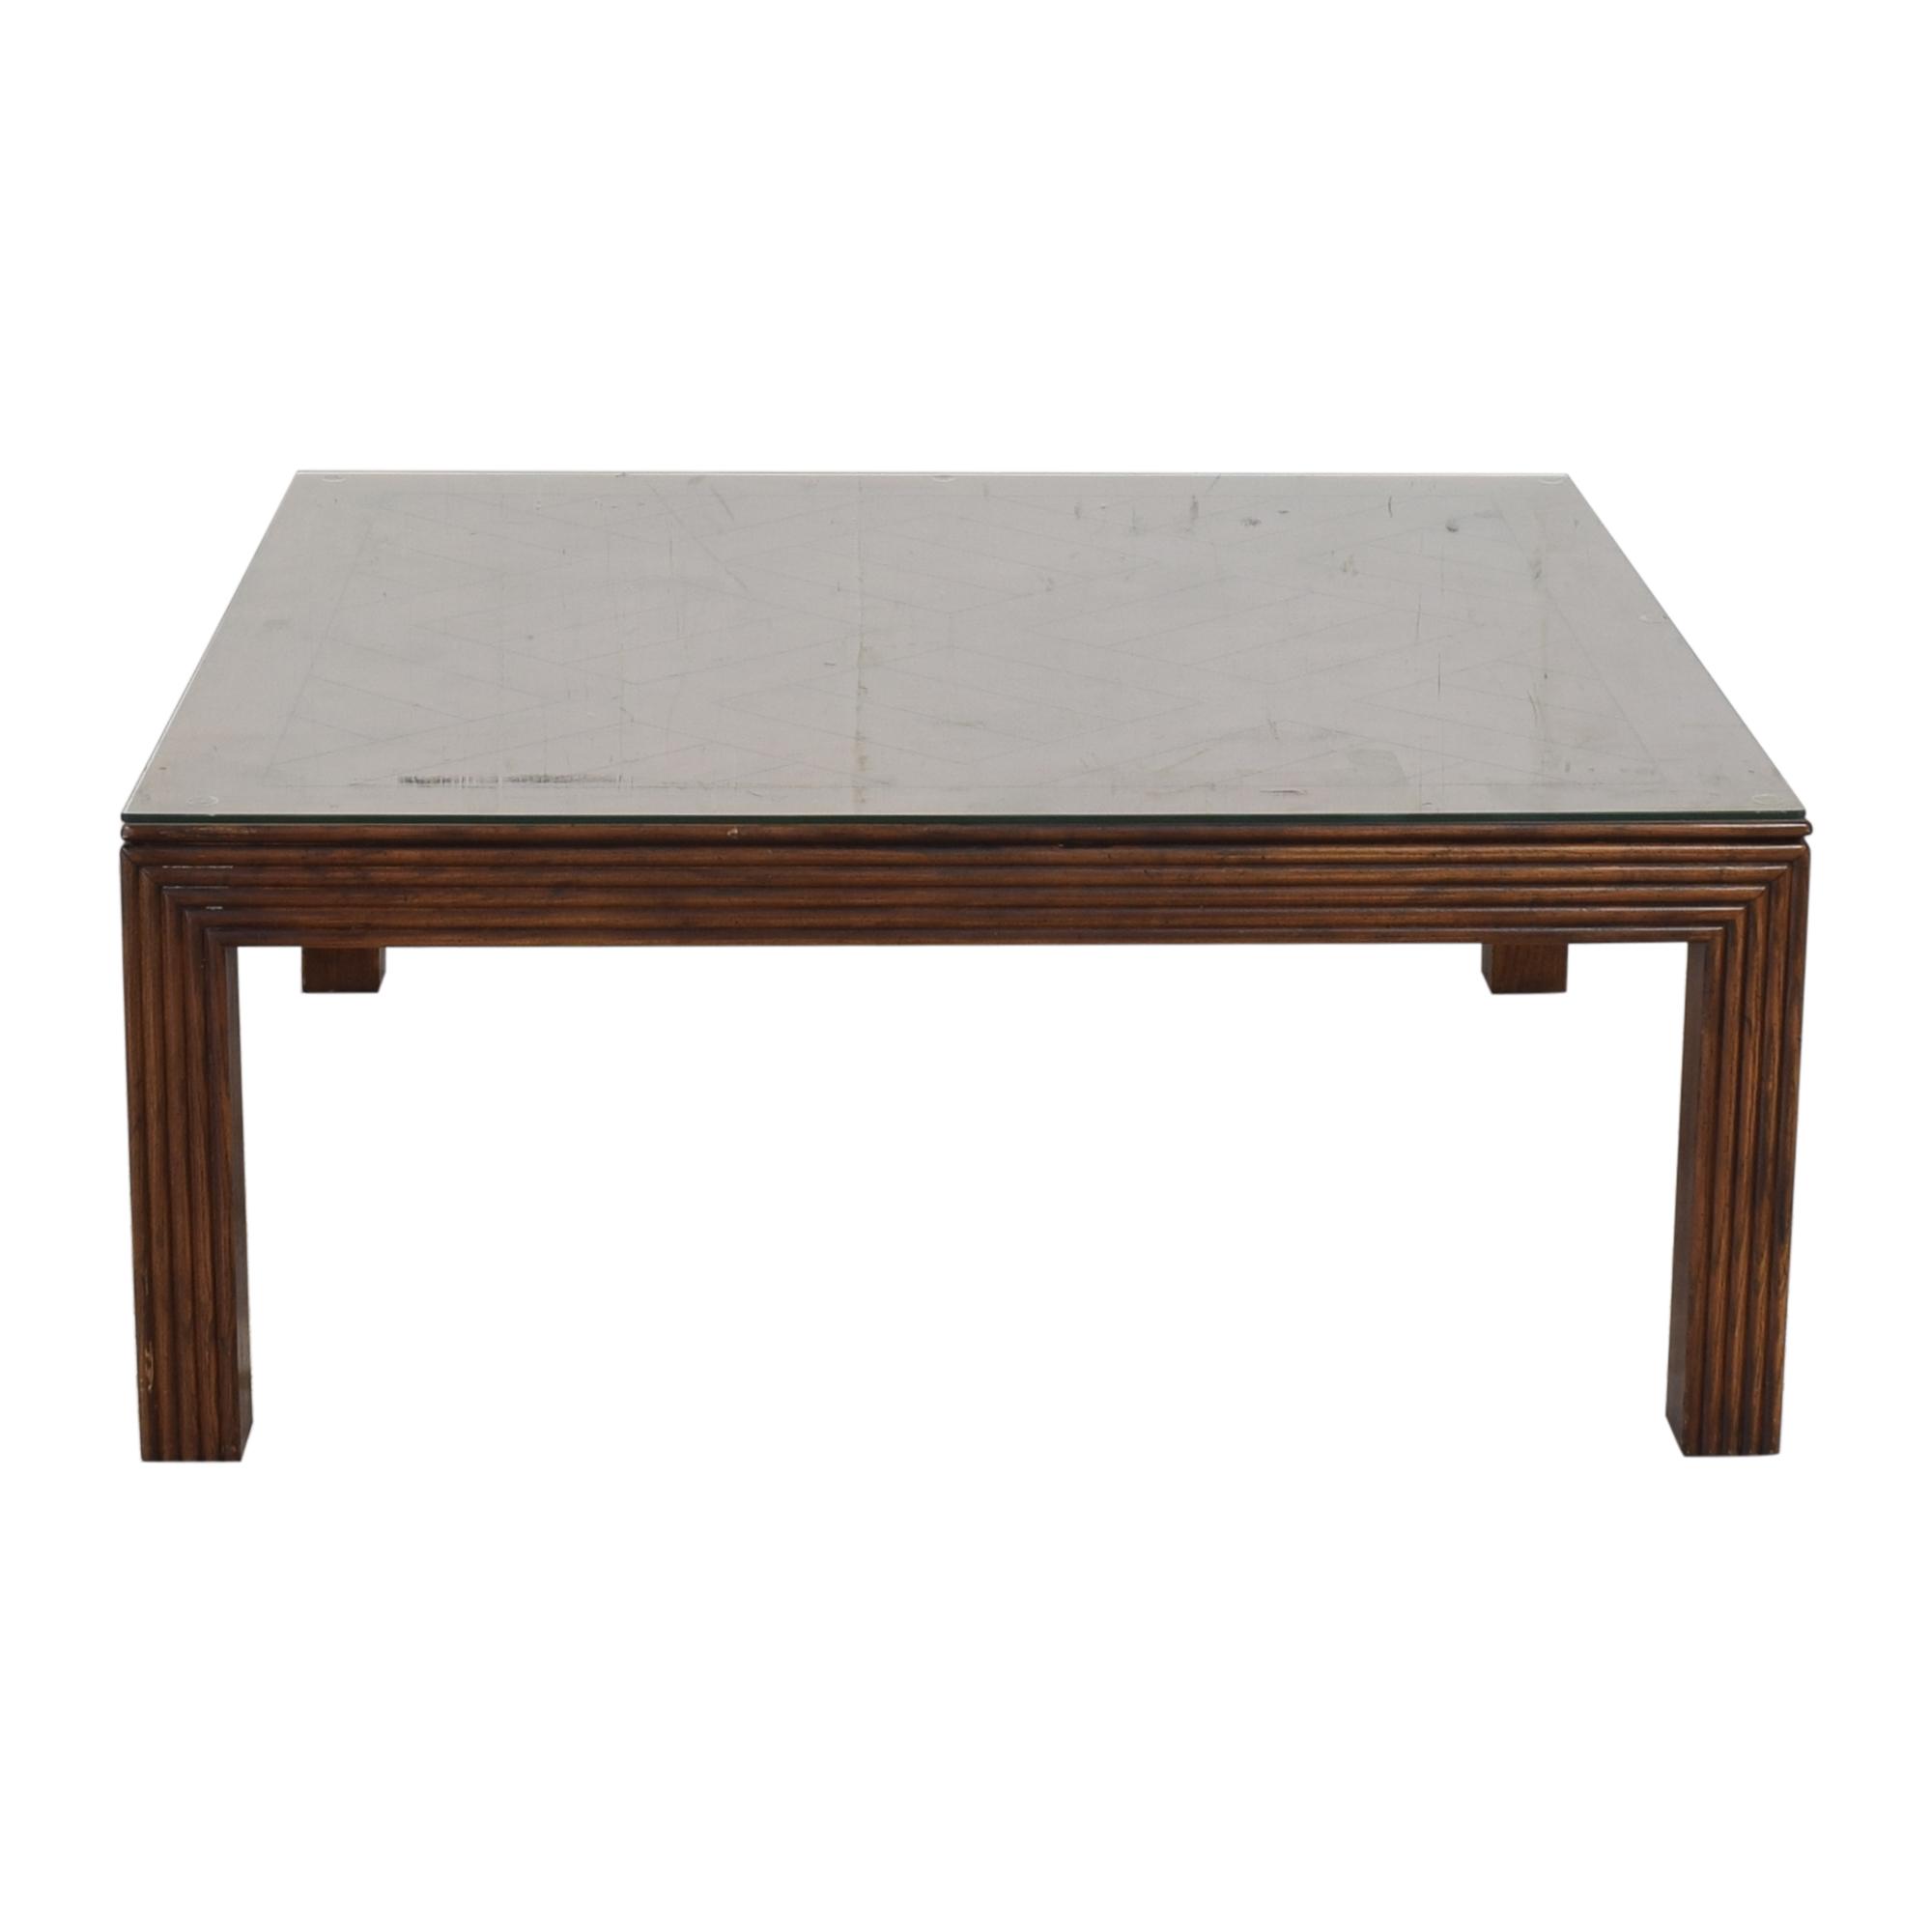 Henredon Furniture Square Coffee Table sale